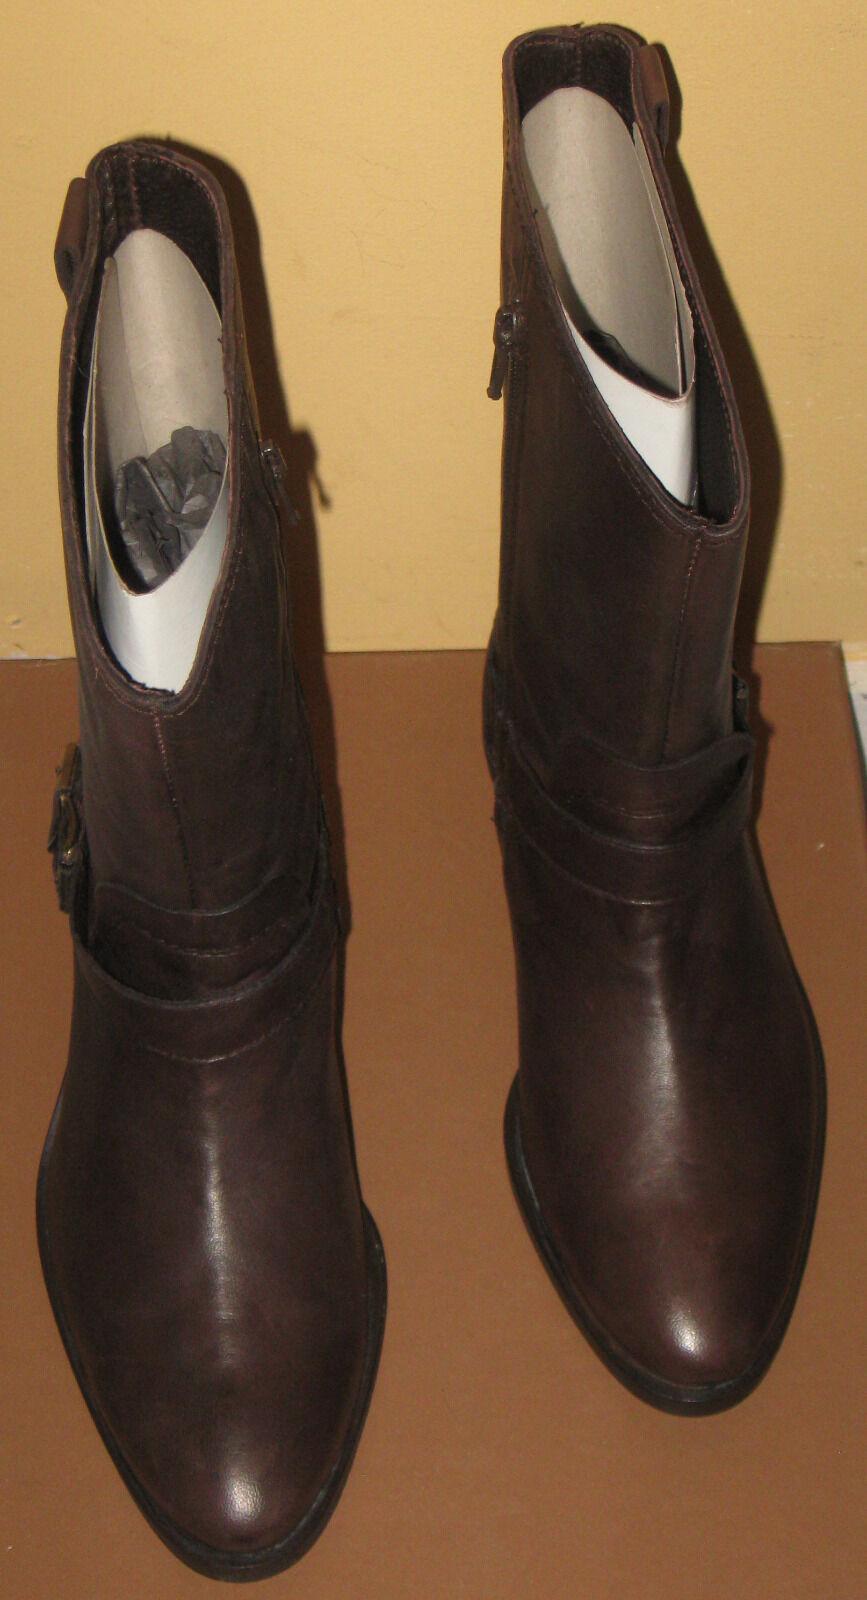 Jane Shilton para Mujer Jody mitad de la Pantorrilla Bota De Cuero Marrón, UK3, 5000064768361